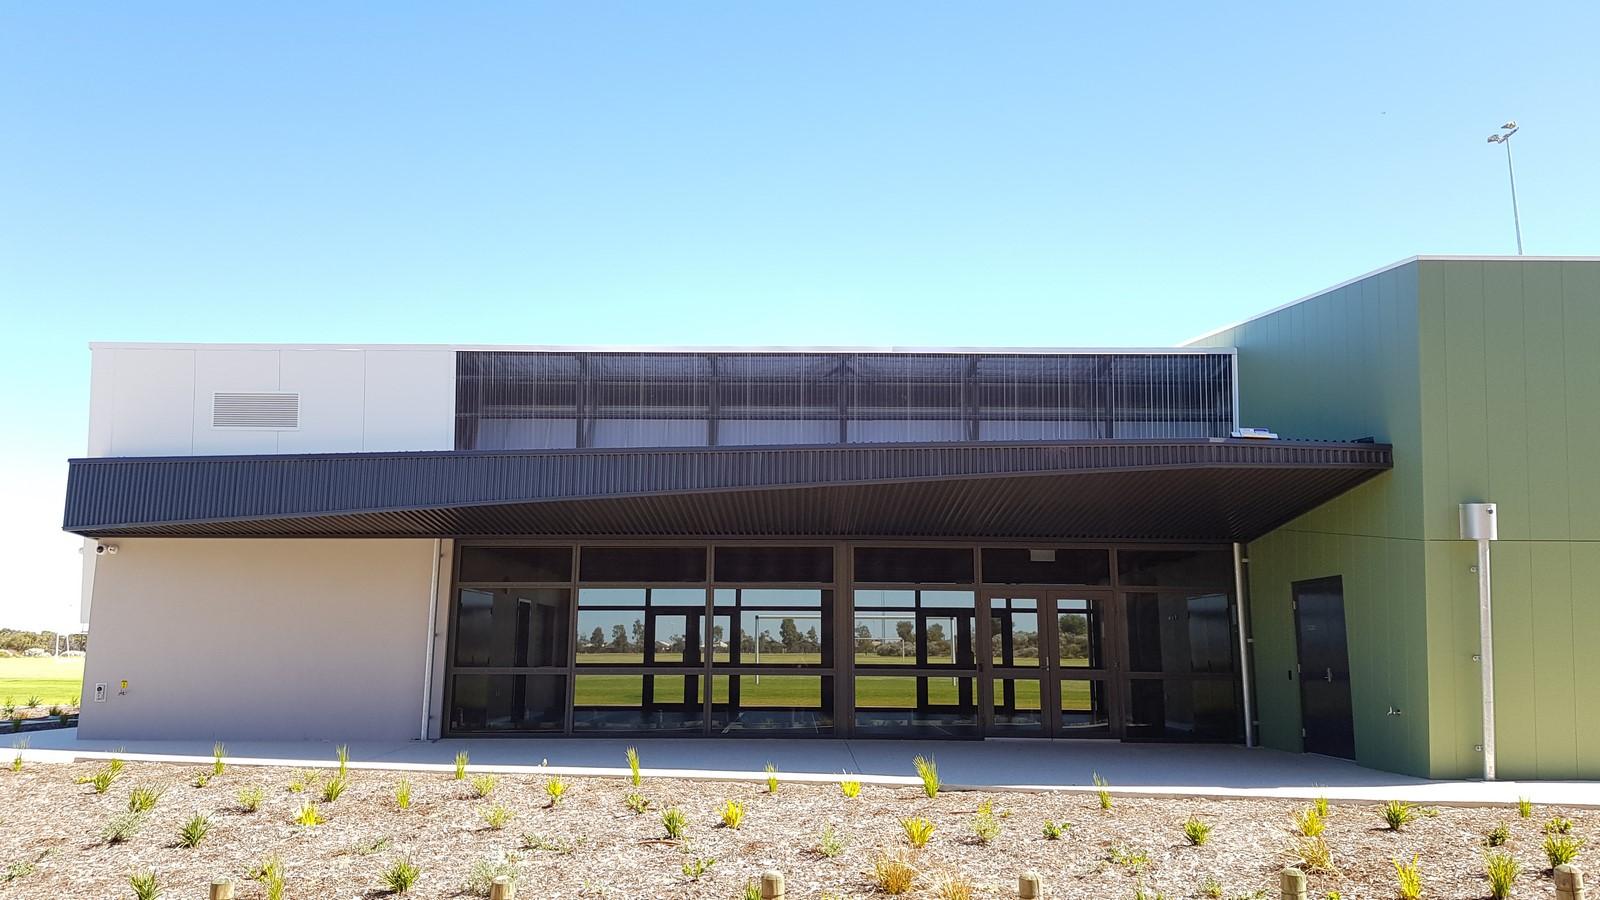 Grandis Park Sports Pavilion, Banksia Grove905 - Sheet2